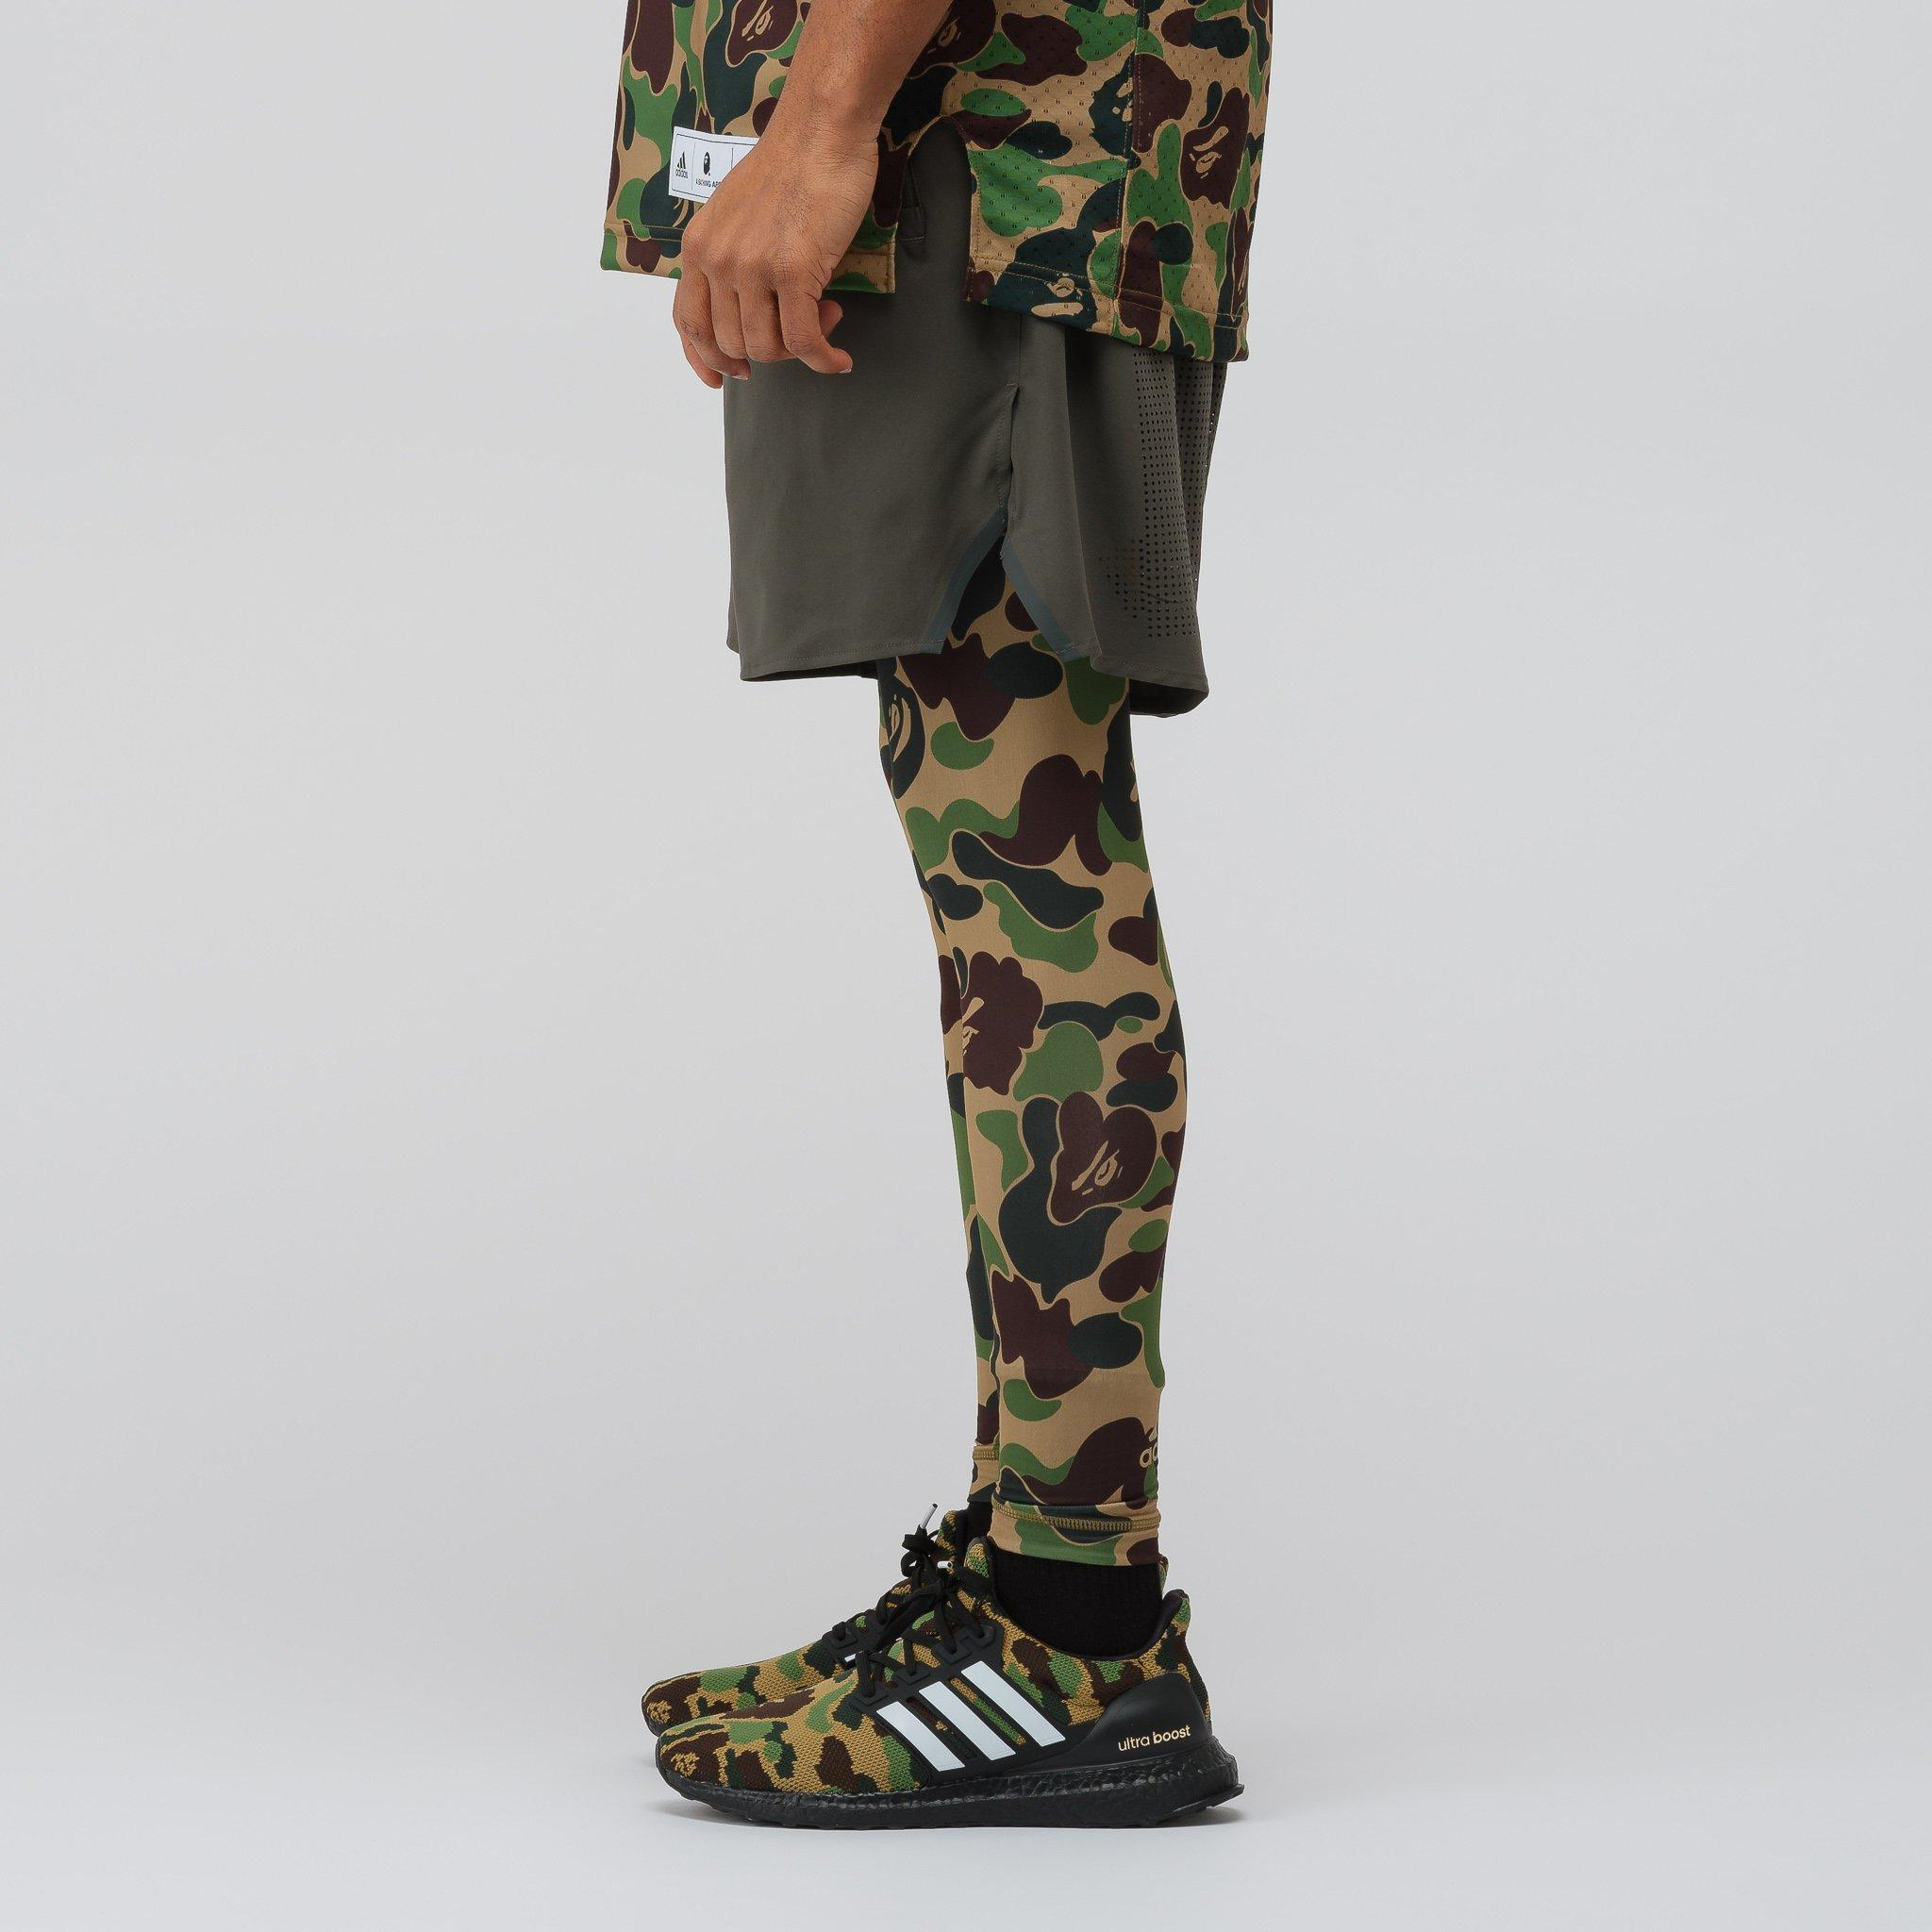 buy \u003e adidas bape tights, Up to 78% OFF